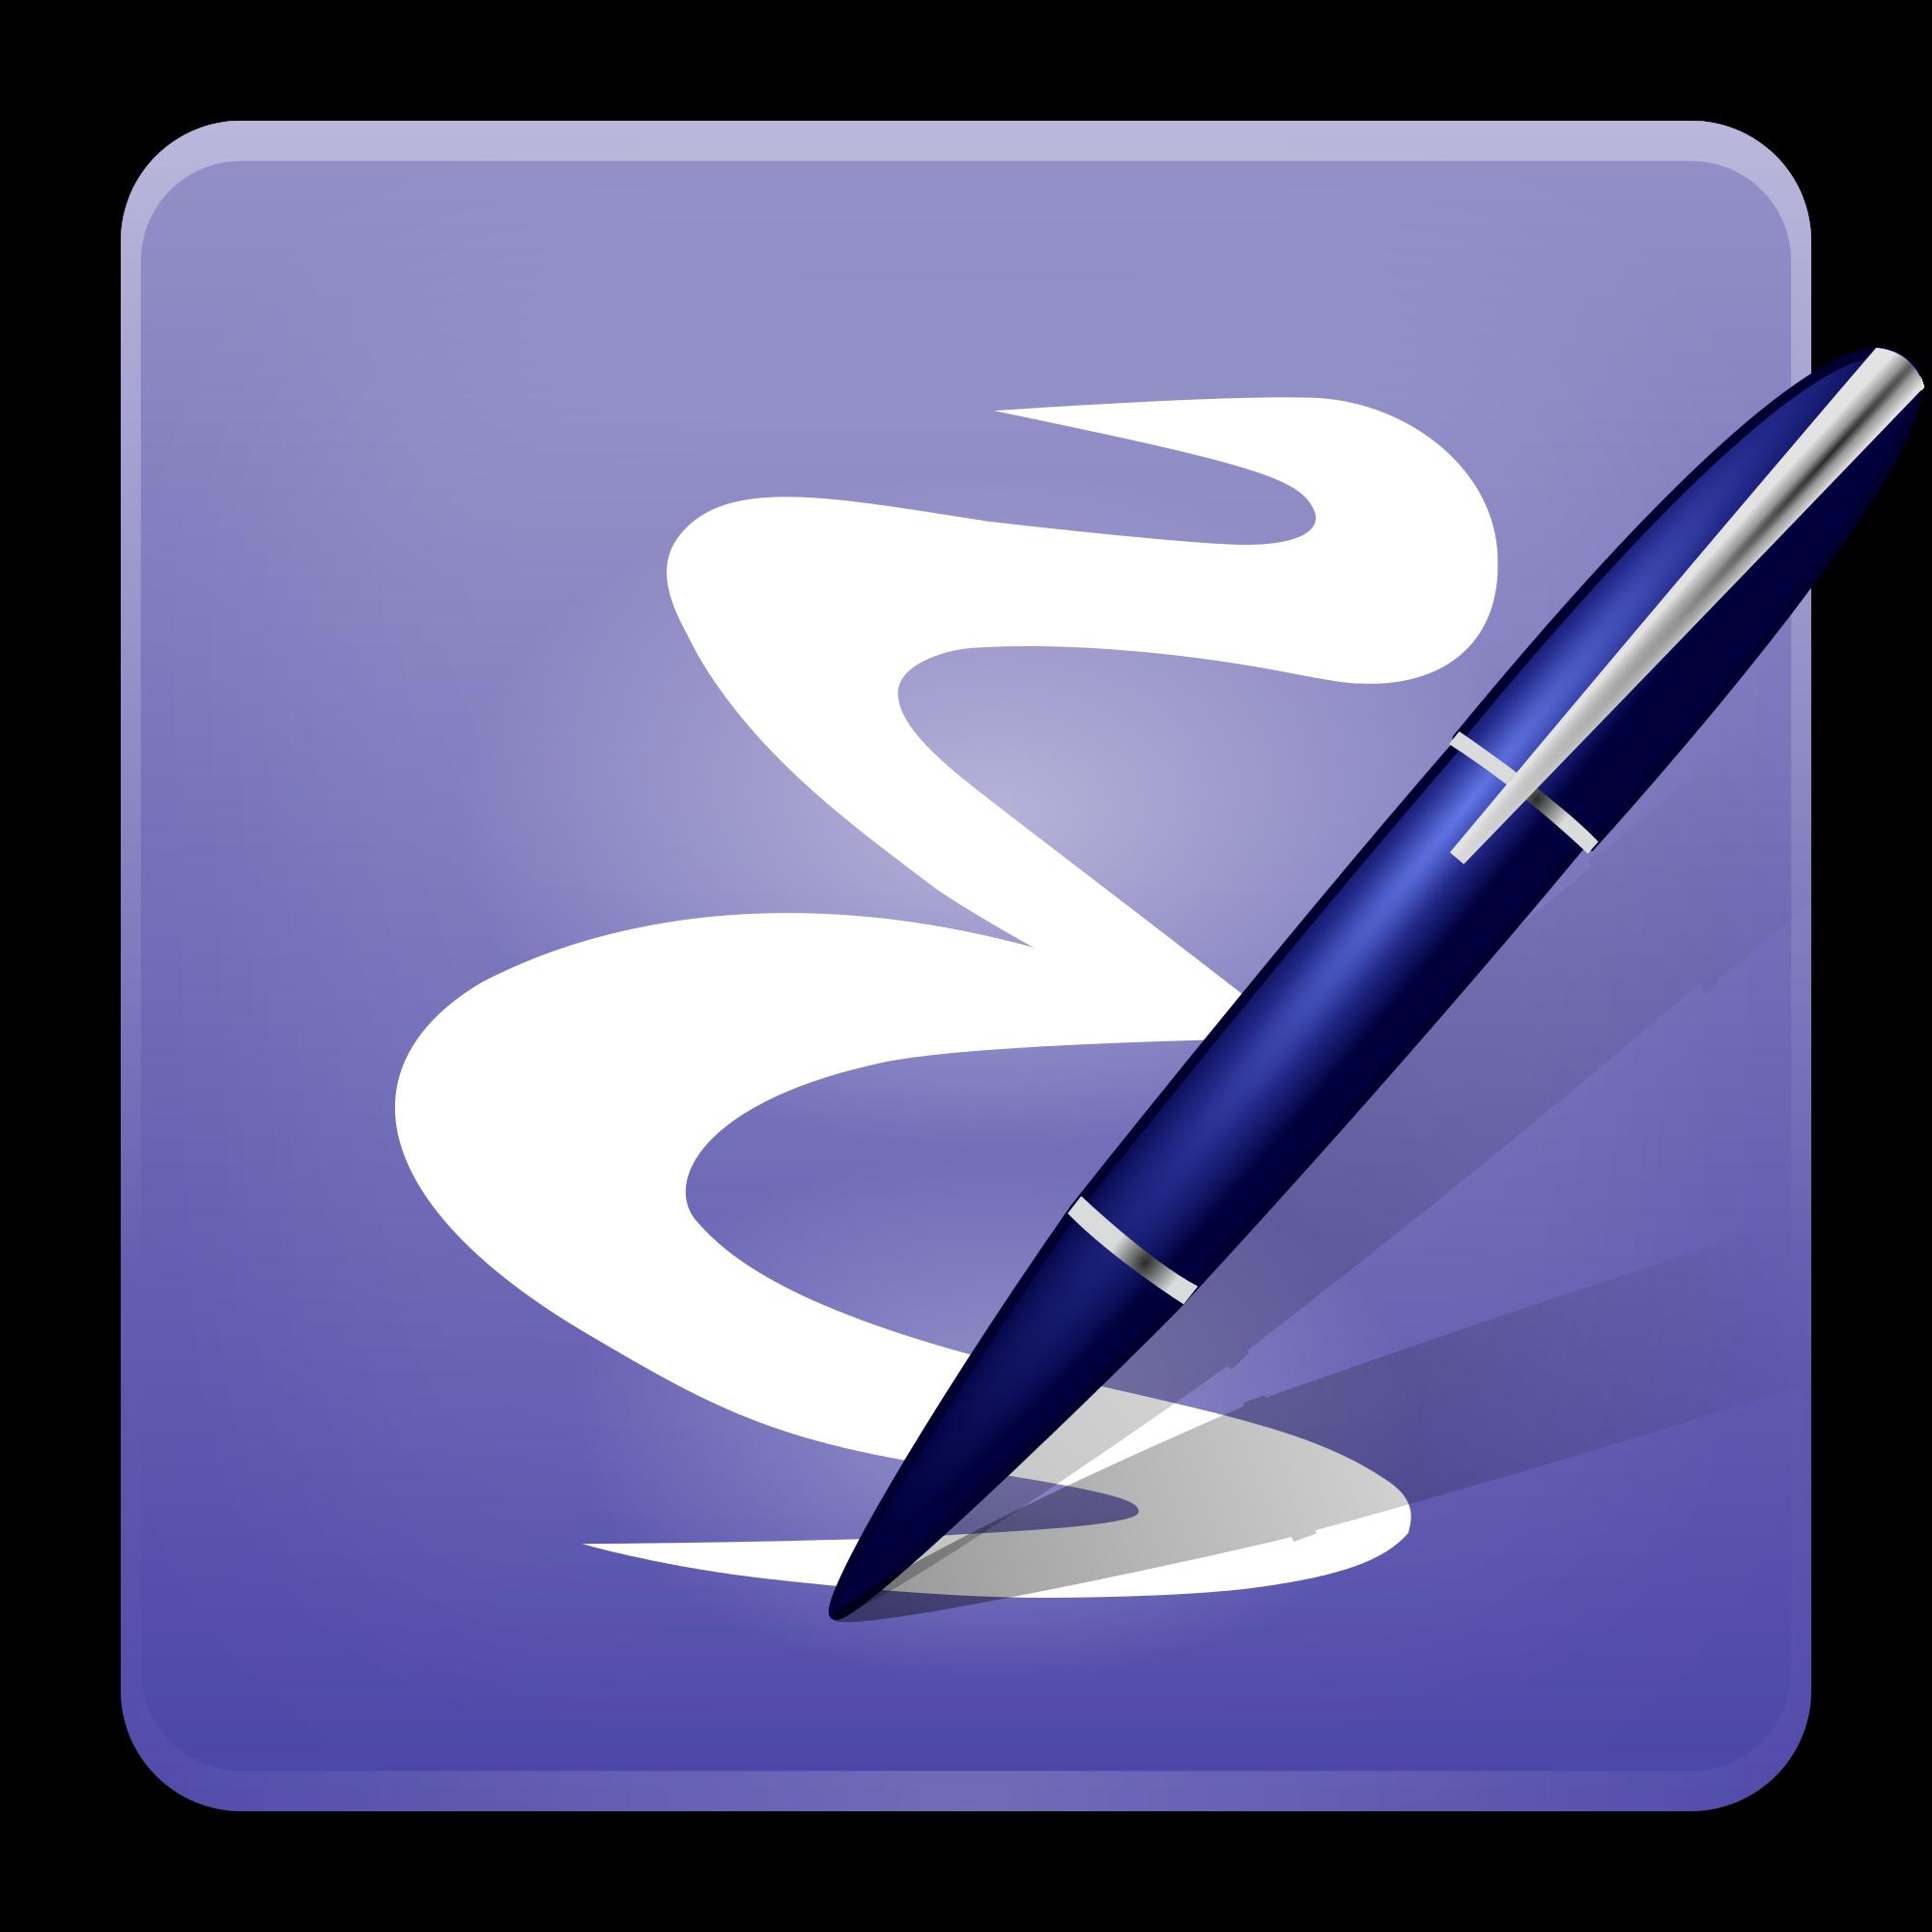 Clipart pen personal statement. File emacs faenza svg